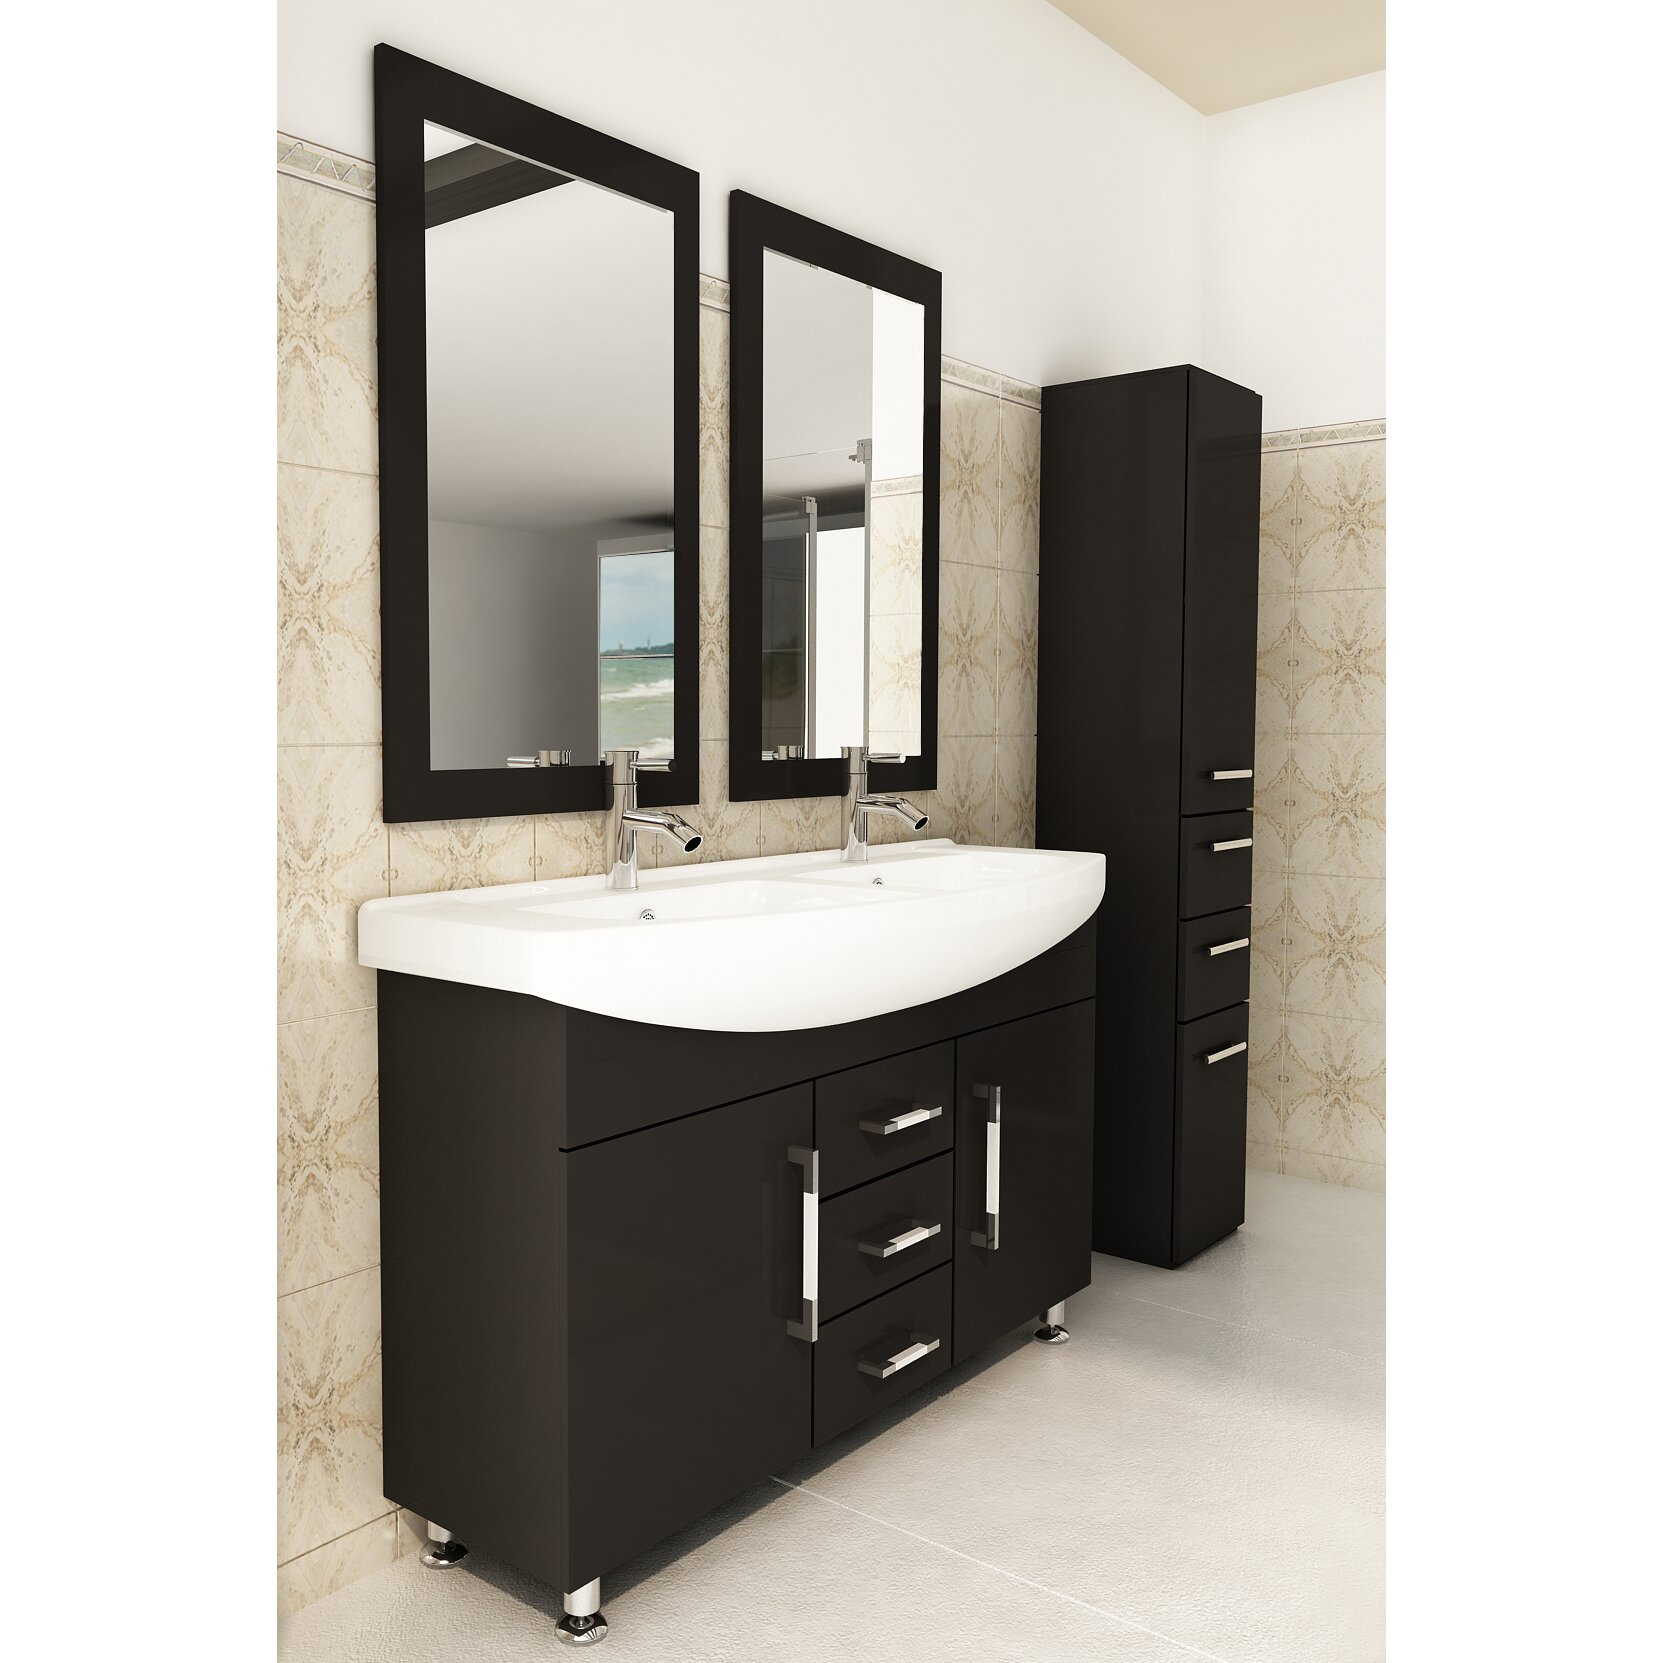 jwh living celine 48 quot  double bathroom vanity set   reviews Ski Lift Bathroom Vanity 48 Inch Double Bathroom Vanity